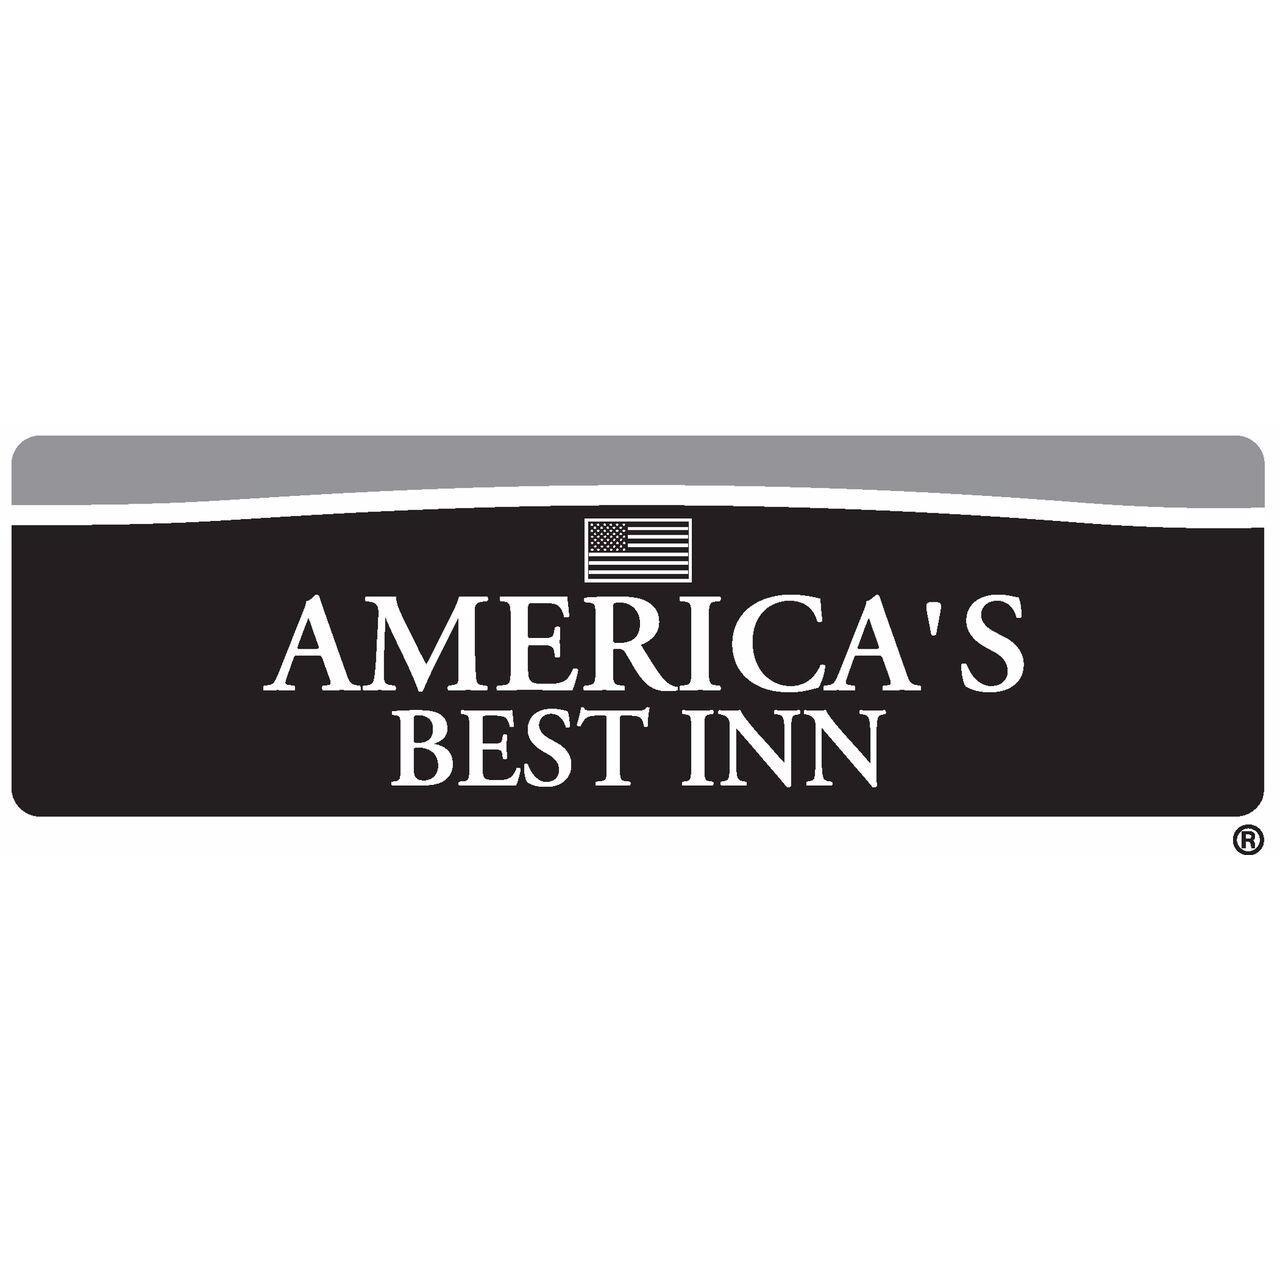 America's Best Inn - Birmingham Airport